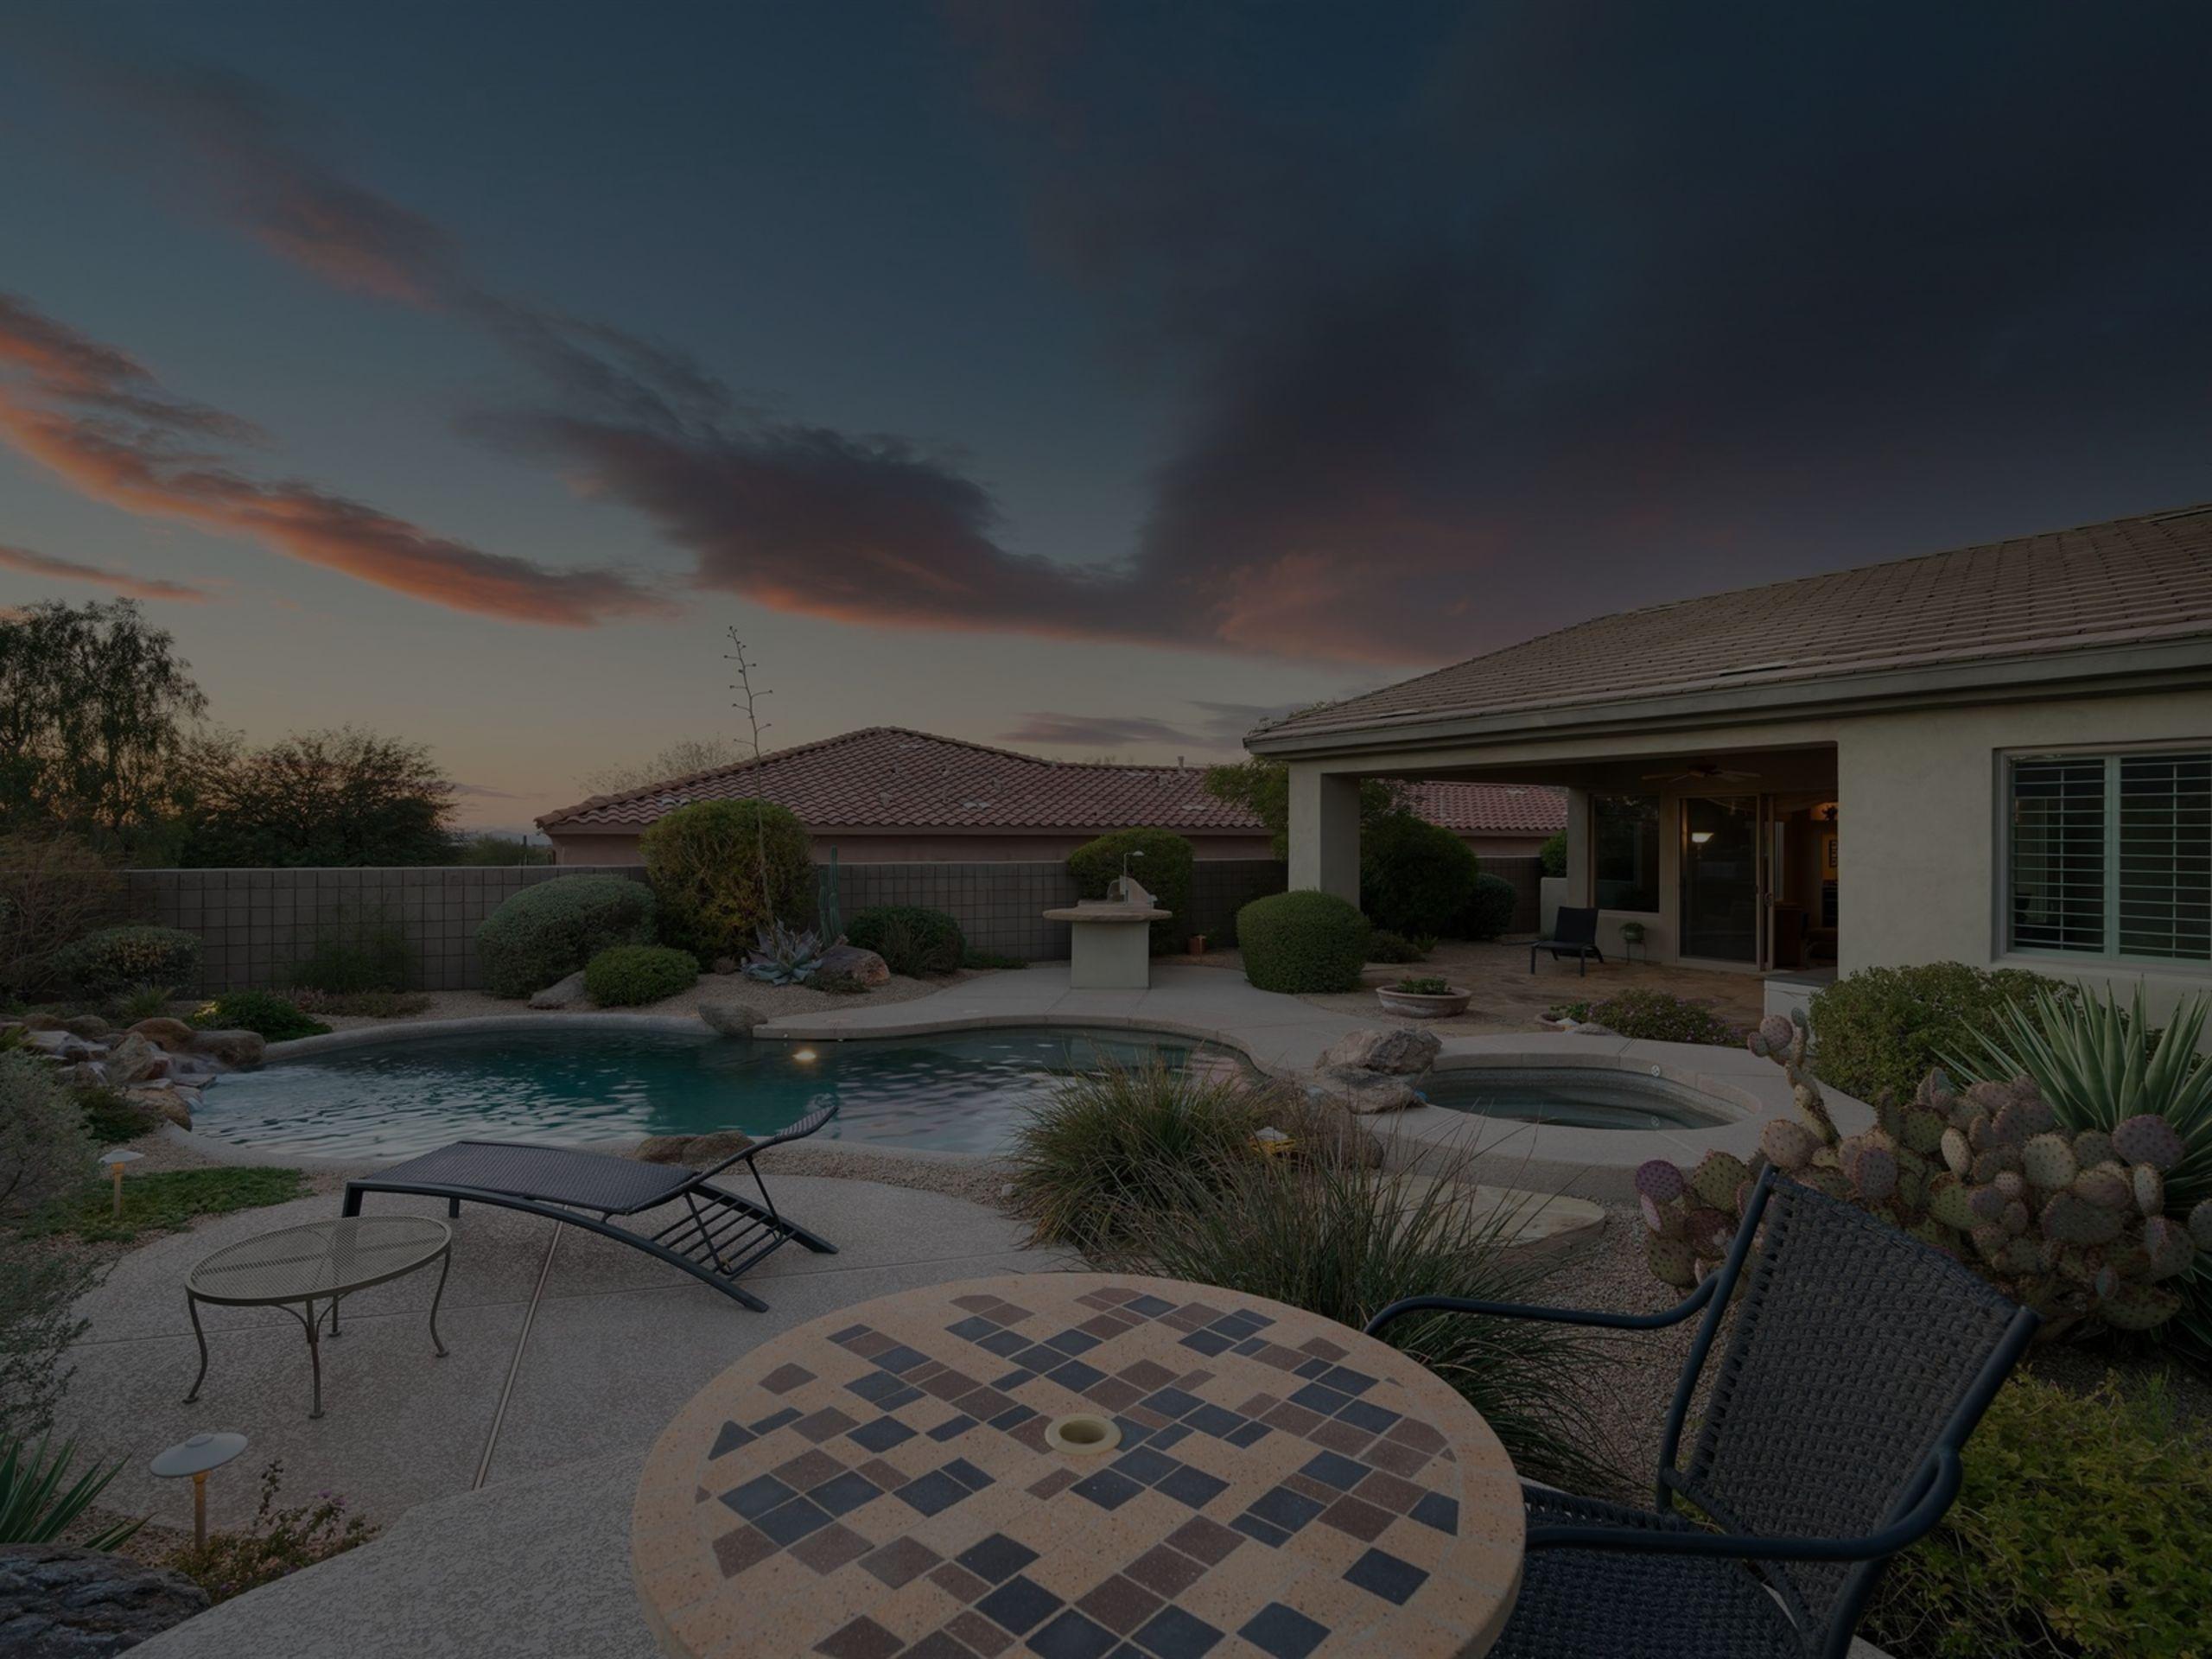 MLS #: 5544449 3 beds 3 baths - $560,000